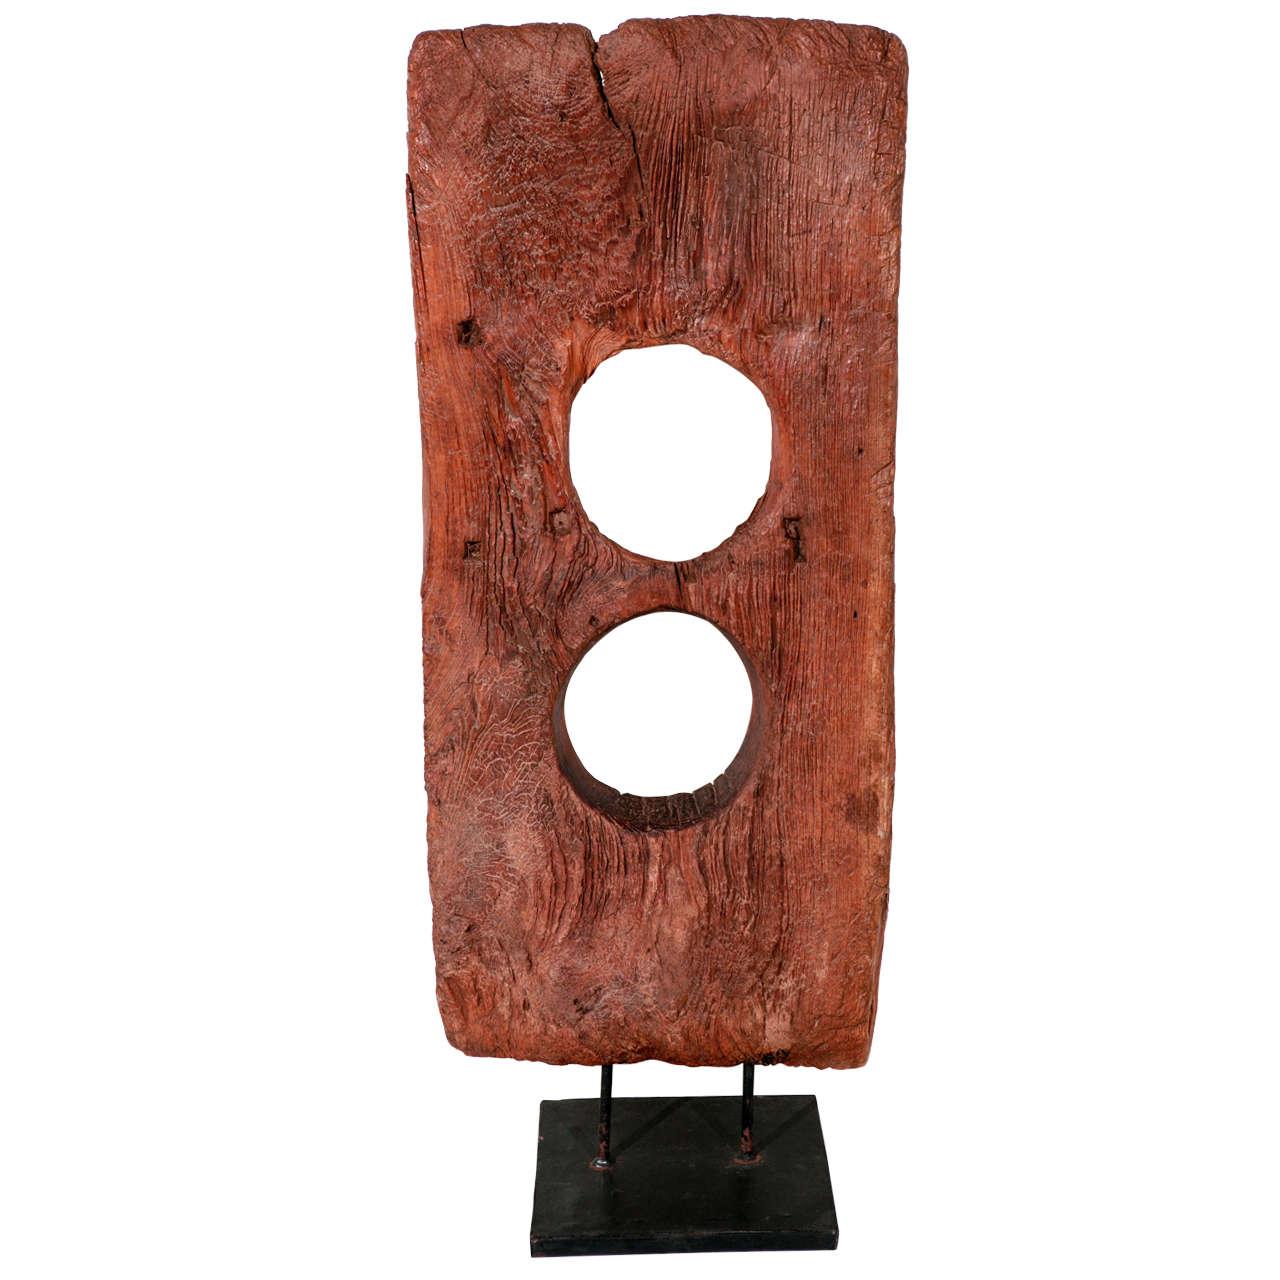 Vintage Hand Hewn Asian Wood Sculpture For Sale